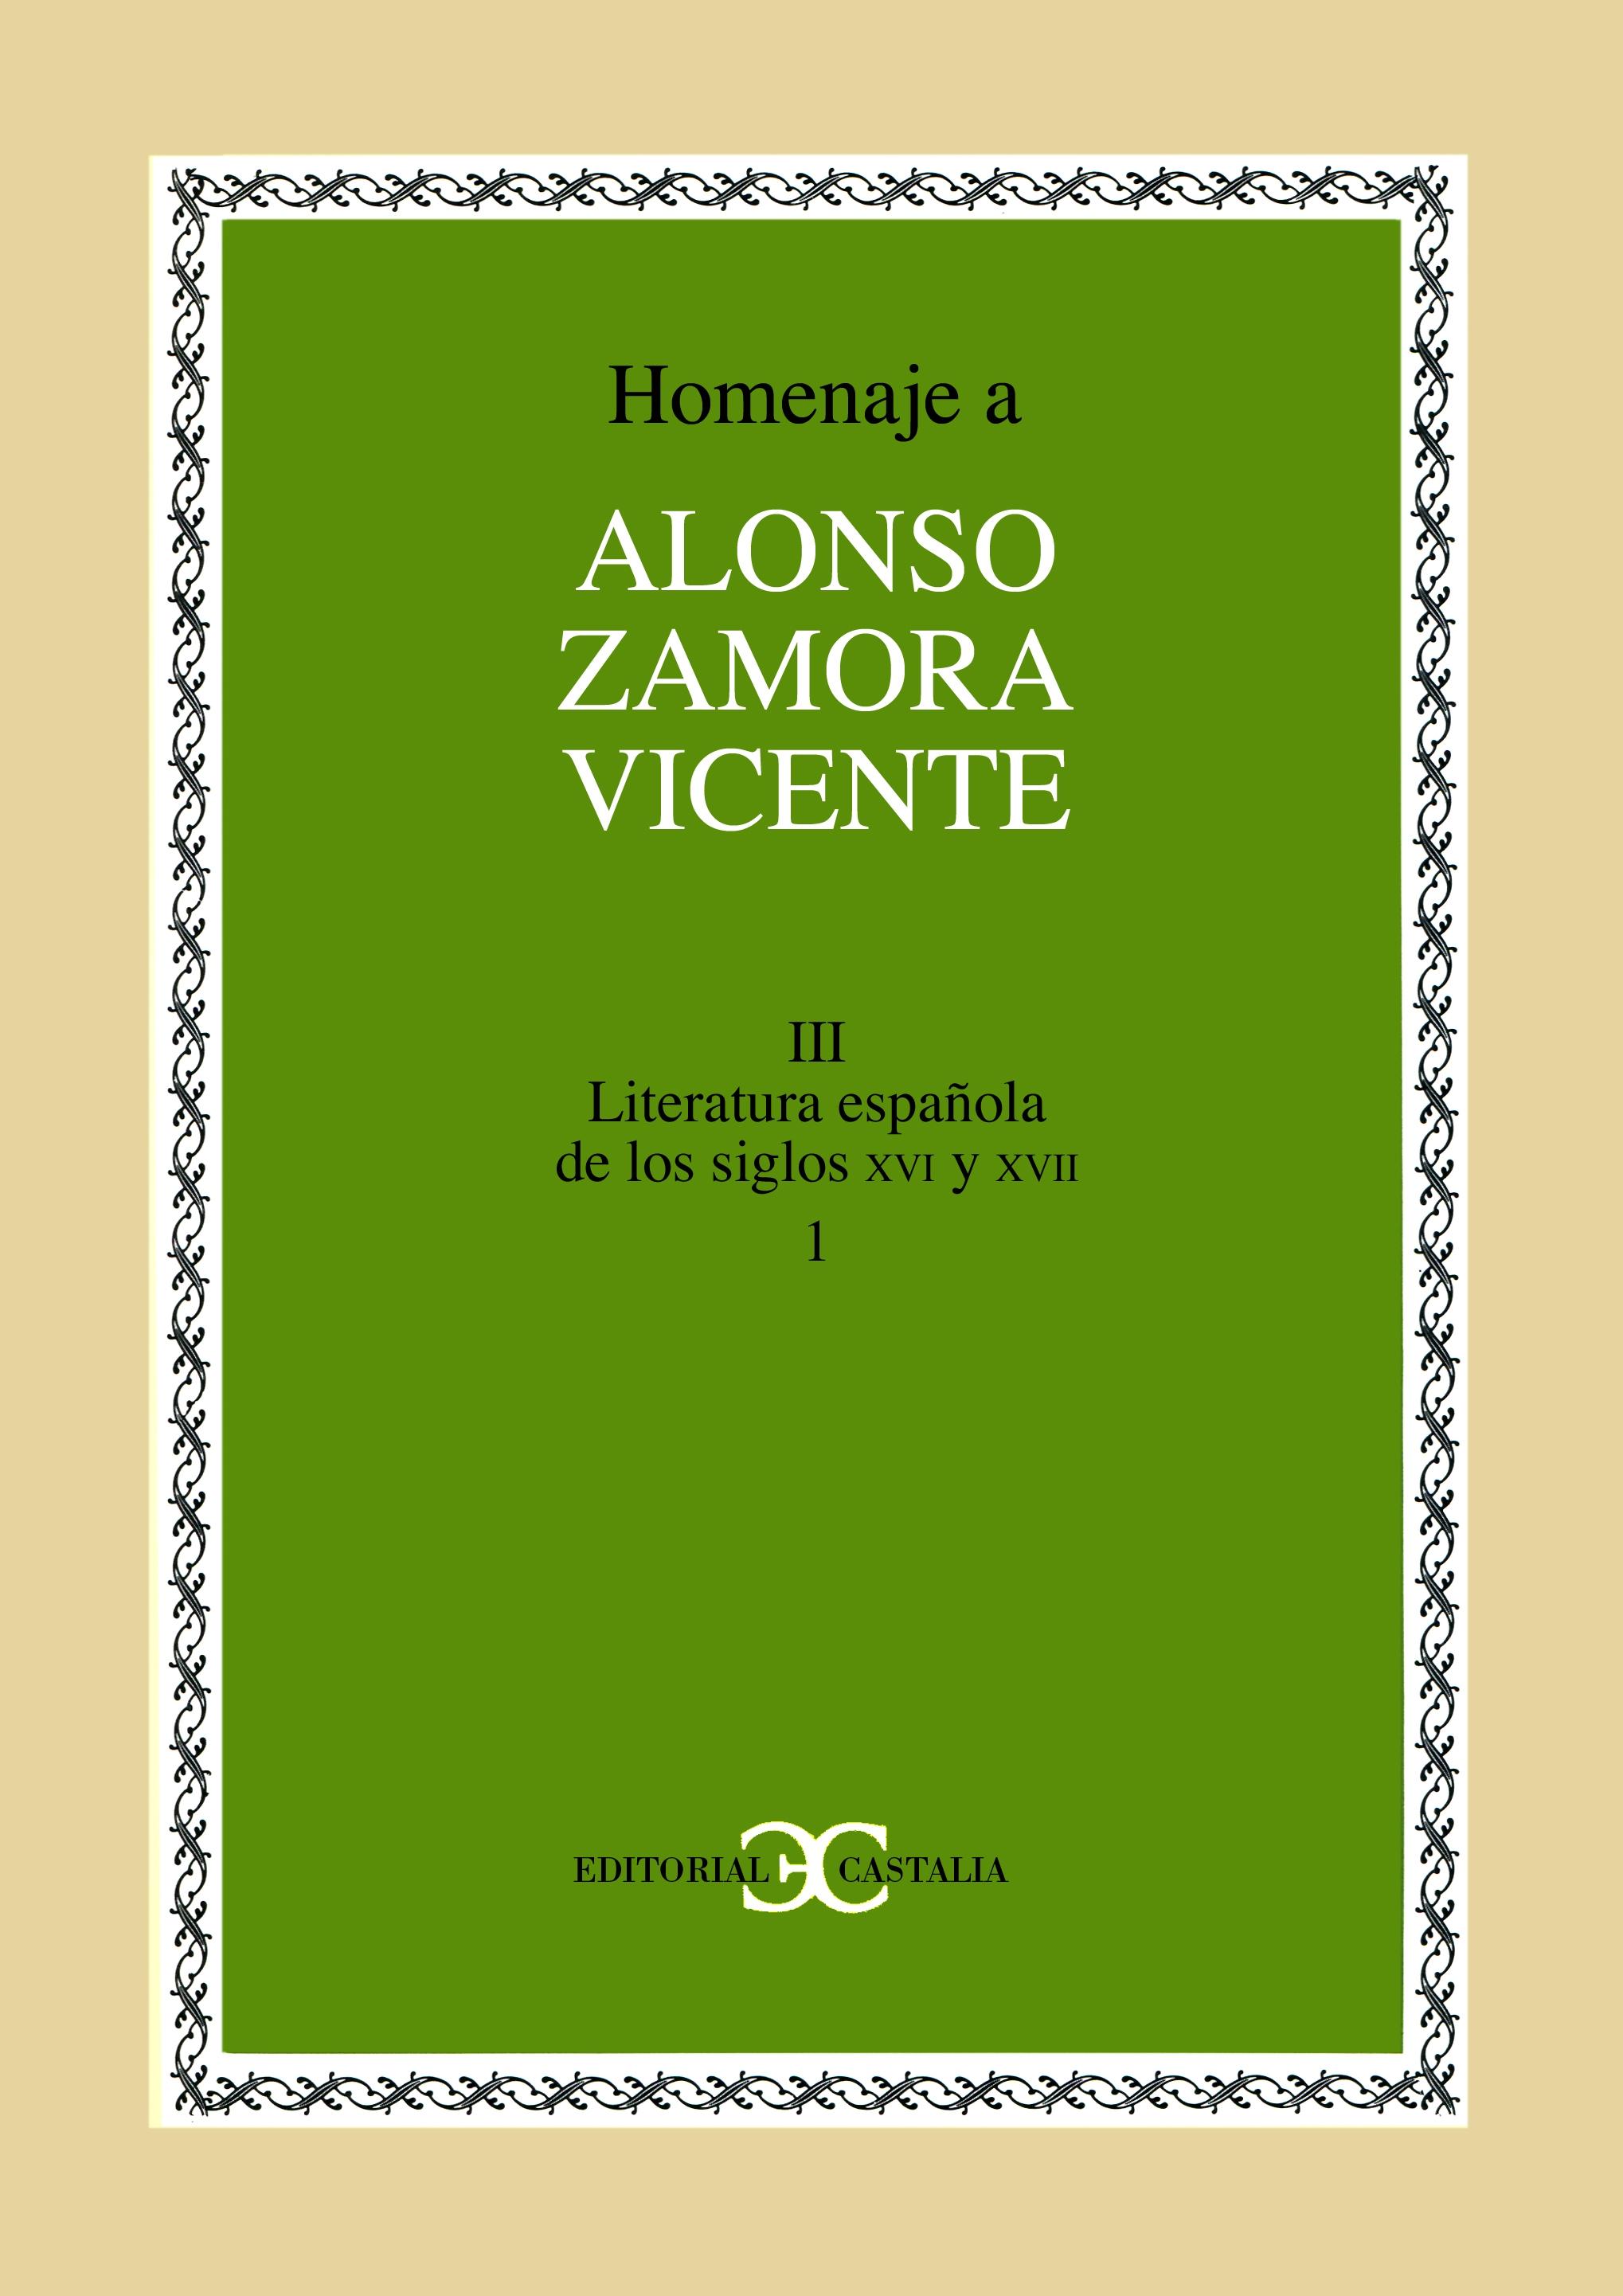 Homenaje a Alonso Zamora Vicente. Volumen III, tomo 1